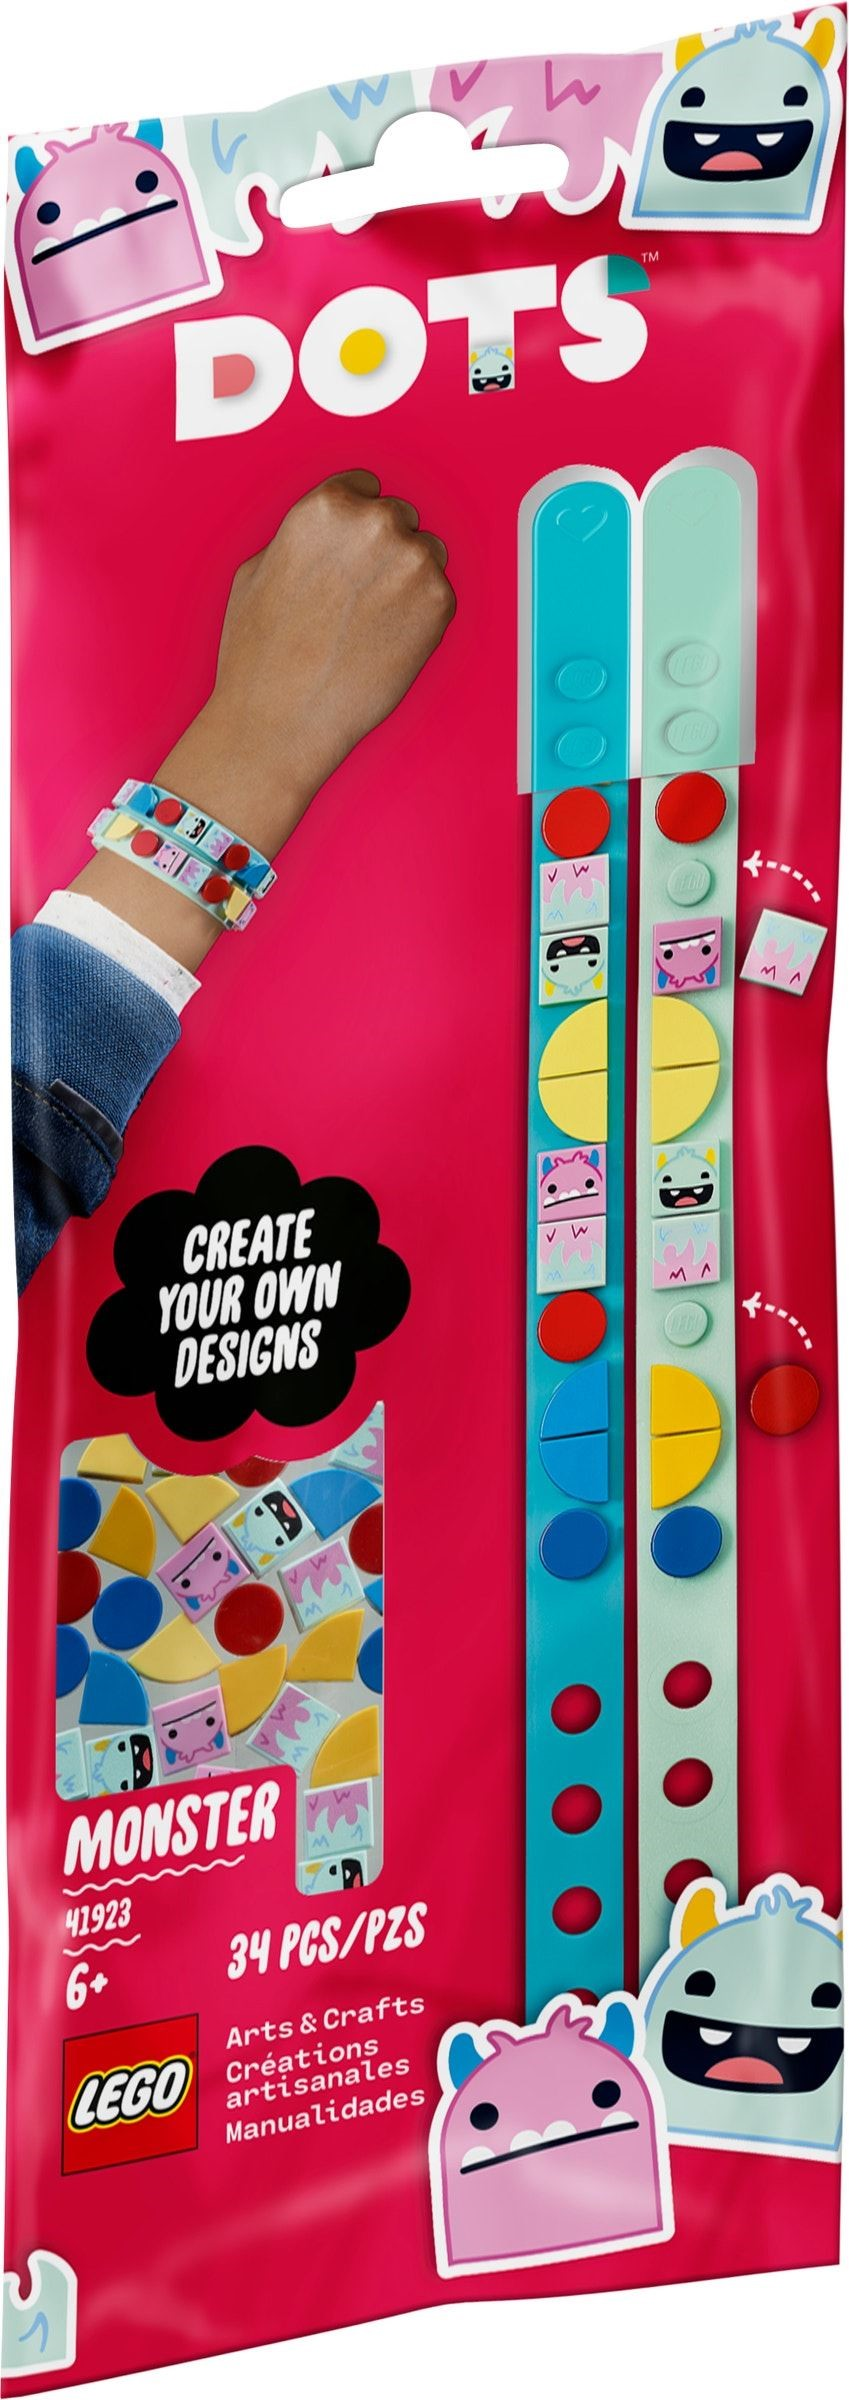 LEGO DOTS - Monster Bracelets (41923)